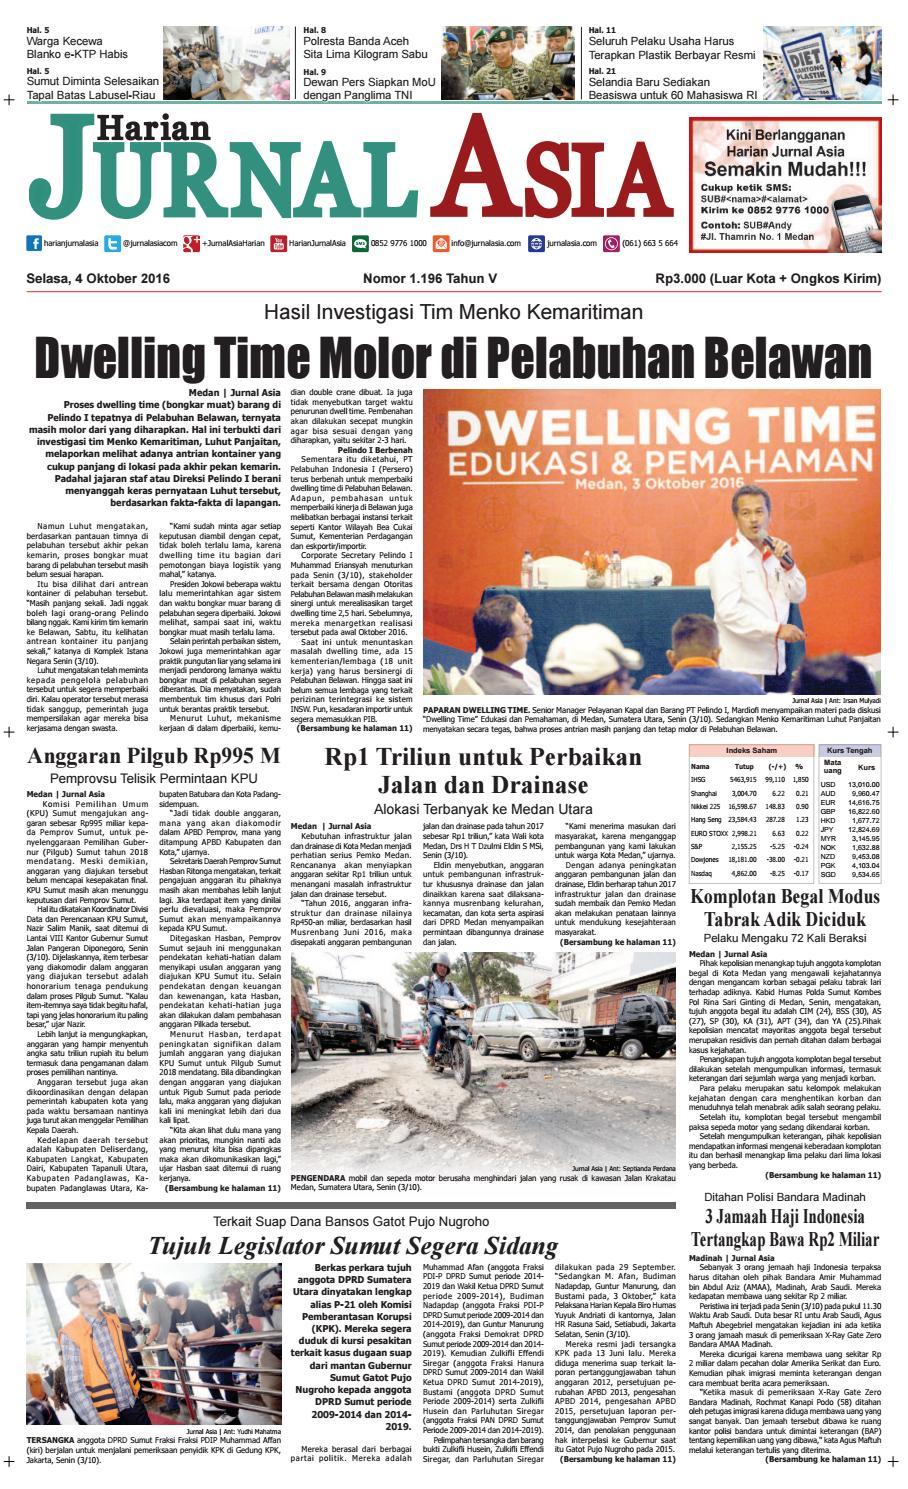 Harian Jurnal Asia Edisi Selasa ccd679144f